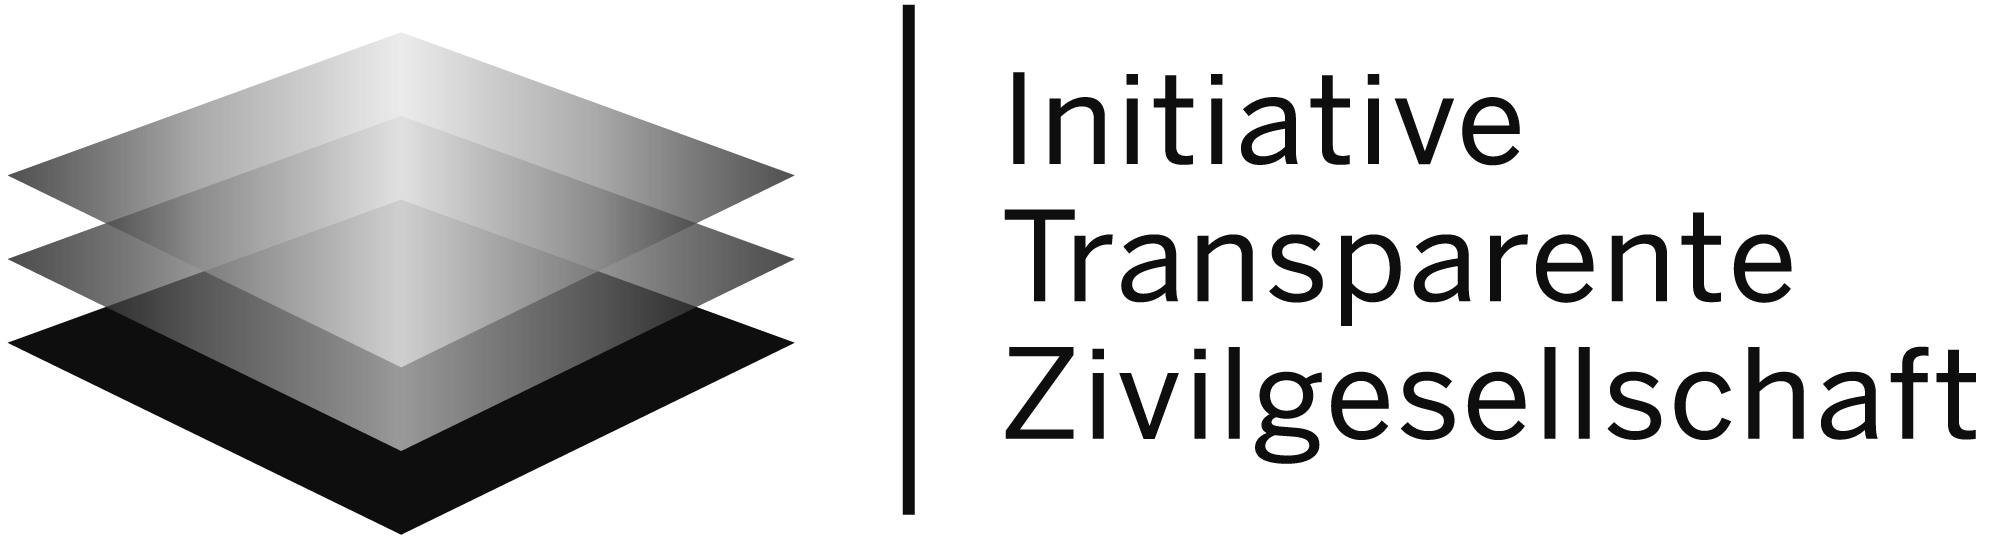 Transparente_Zivilgesellschaft_schwarz_WEB.jpg